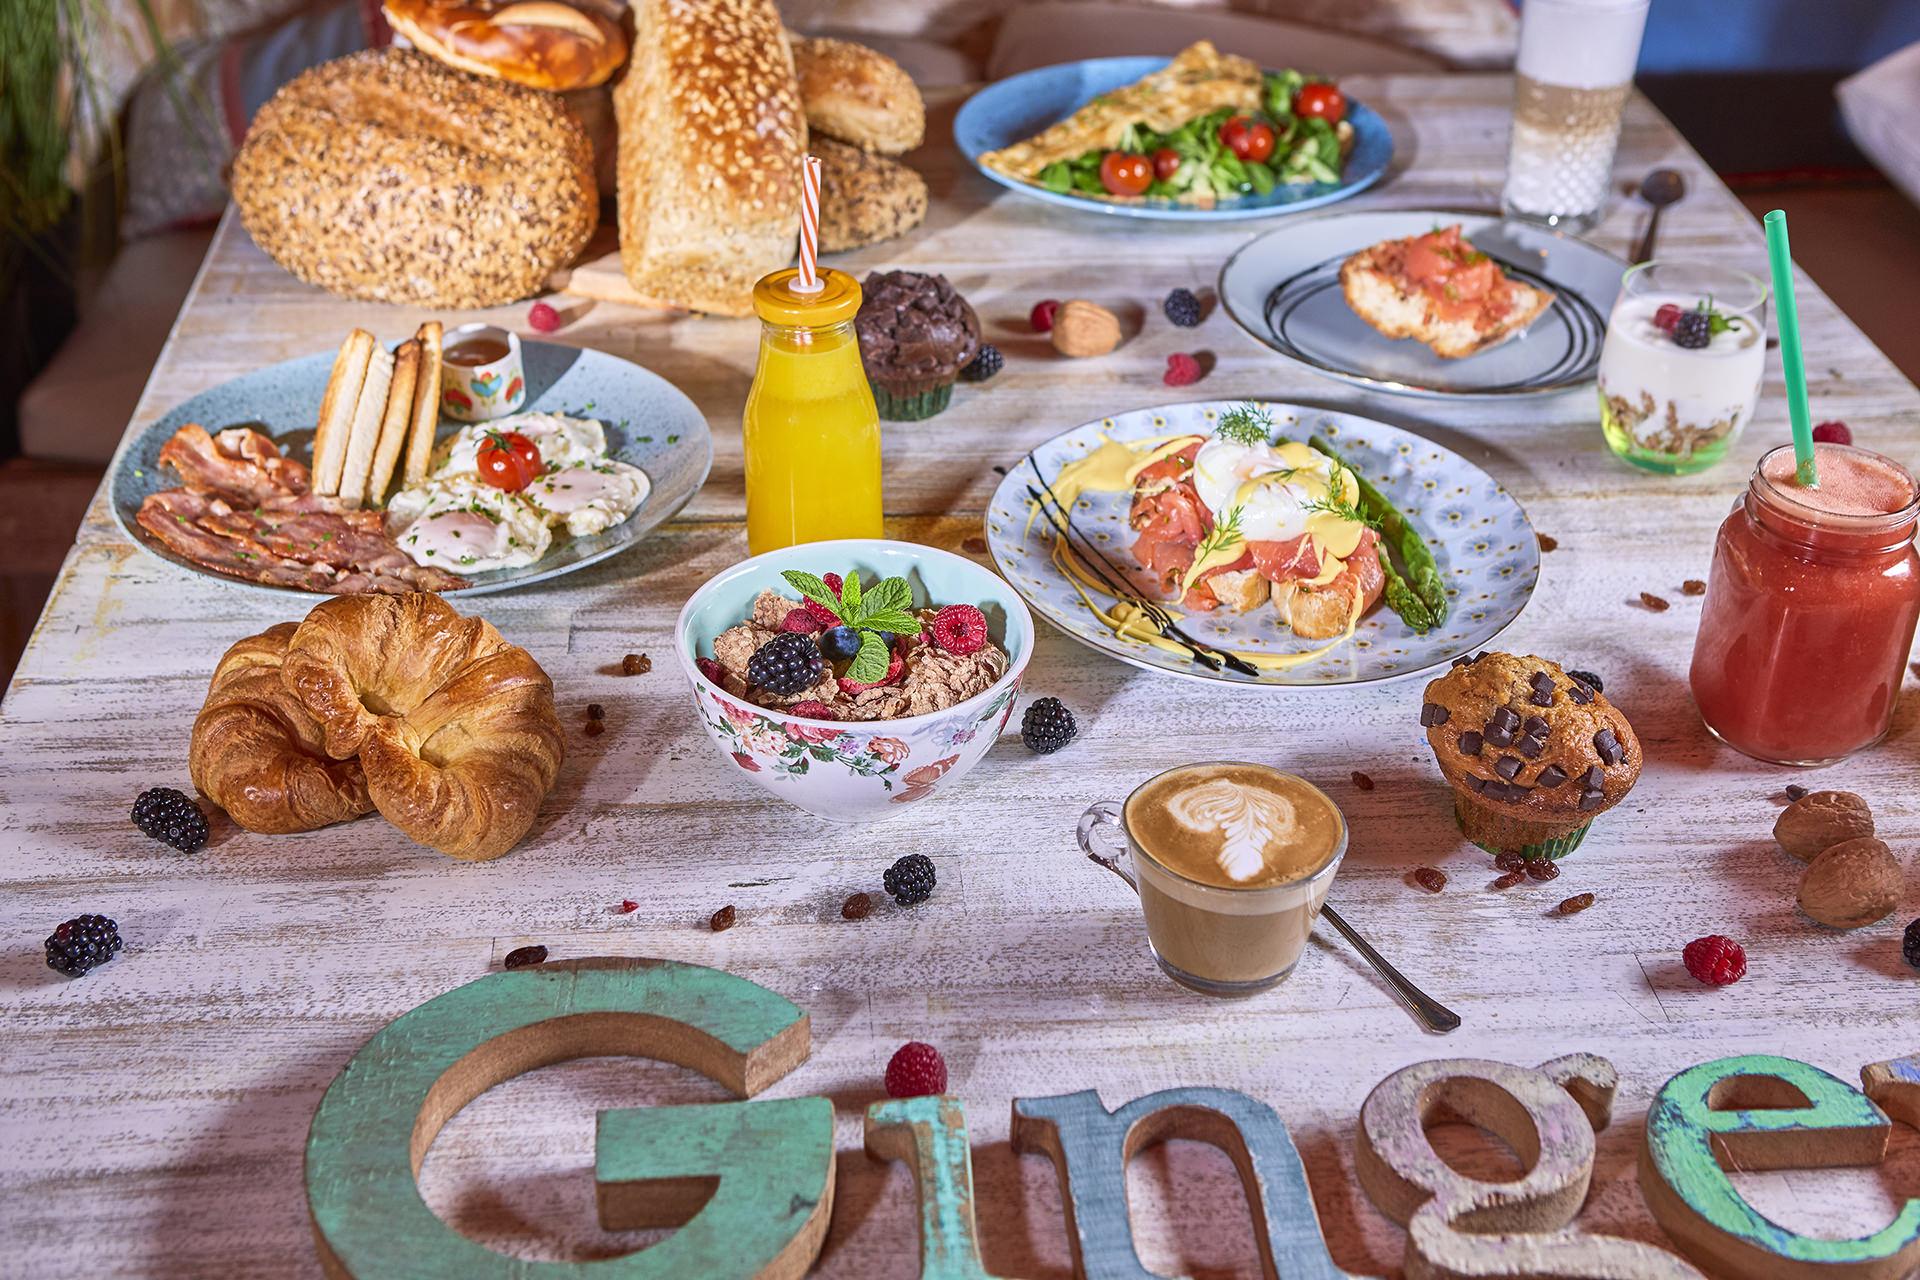 Desayuno en Ginger, Playa de Palma